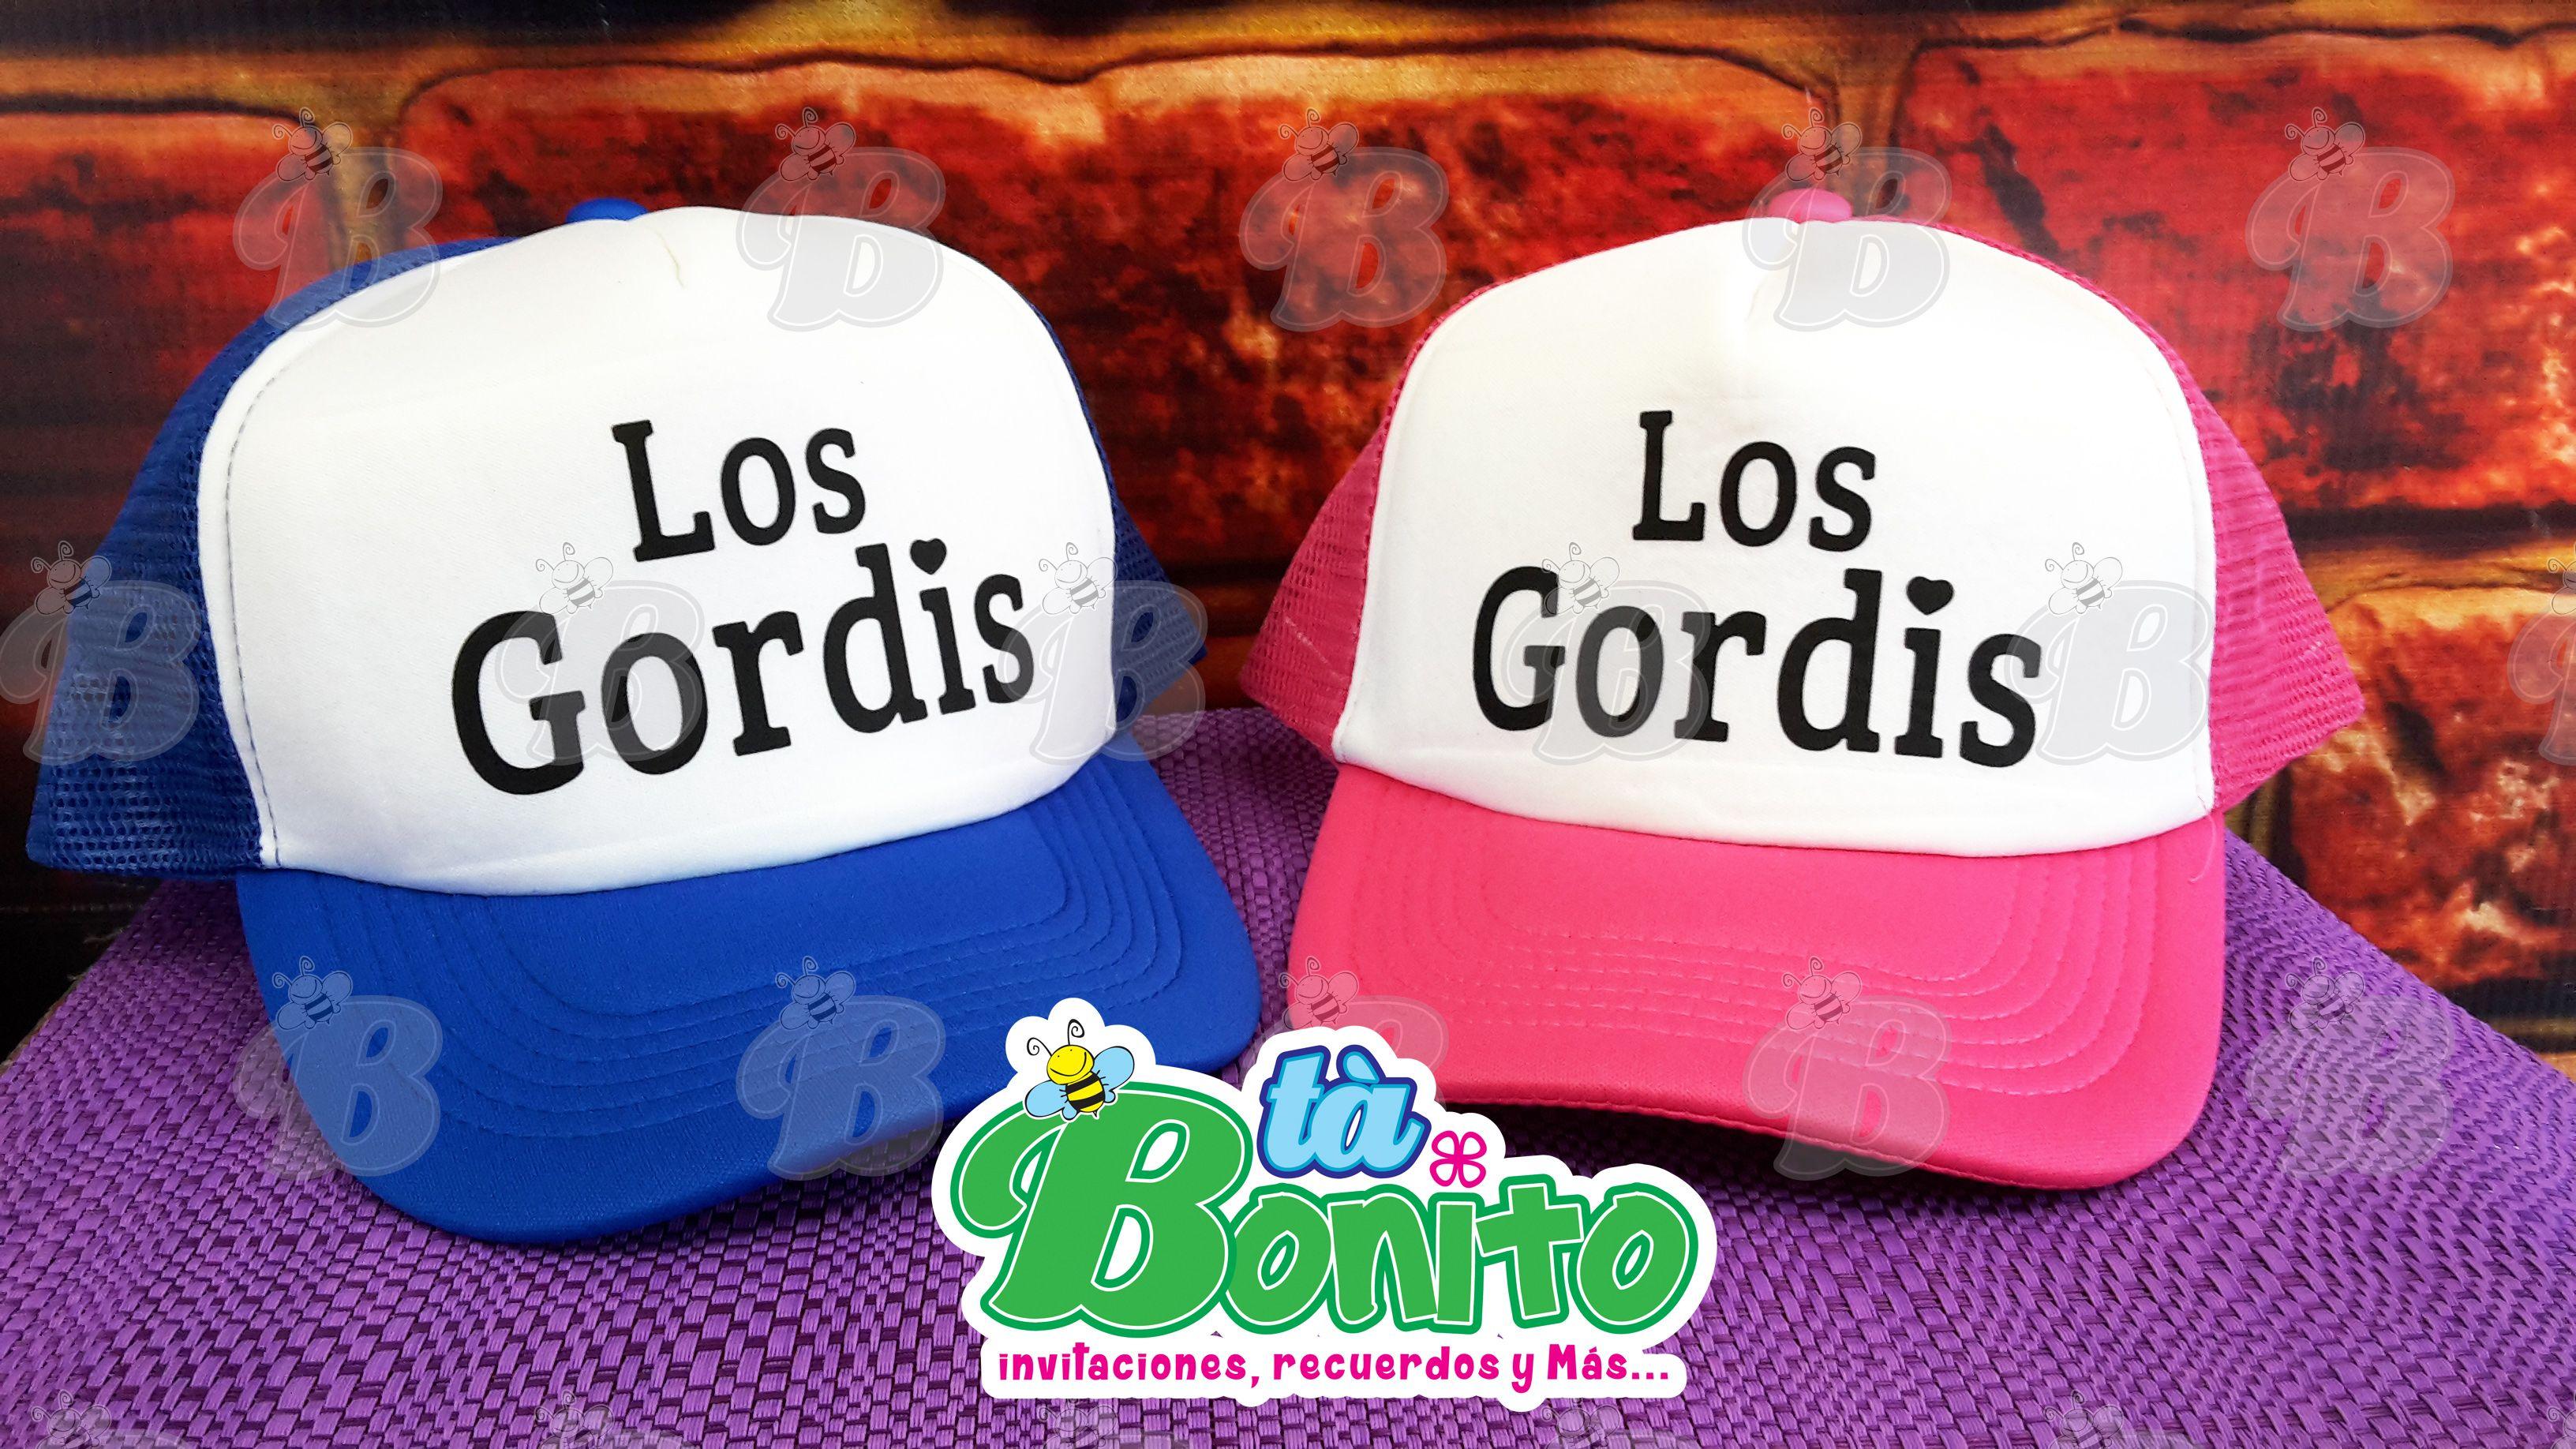 LosGordis  azul  rosa  pareja  gorras  Love  veracruz  mexico ... 5ecdc76d97d